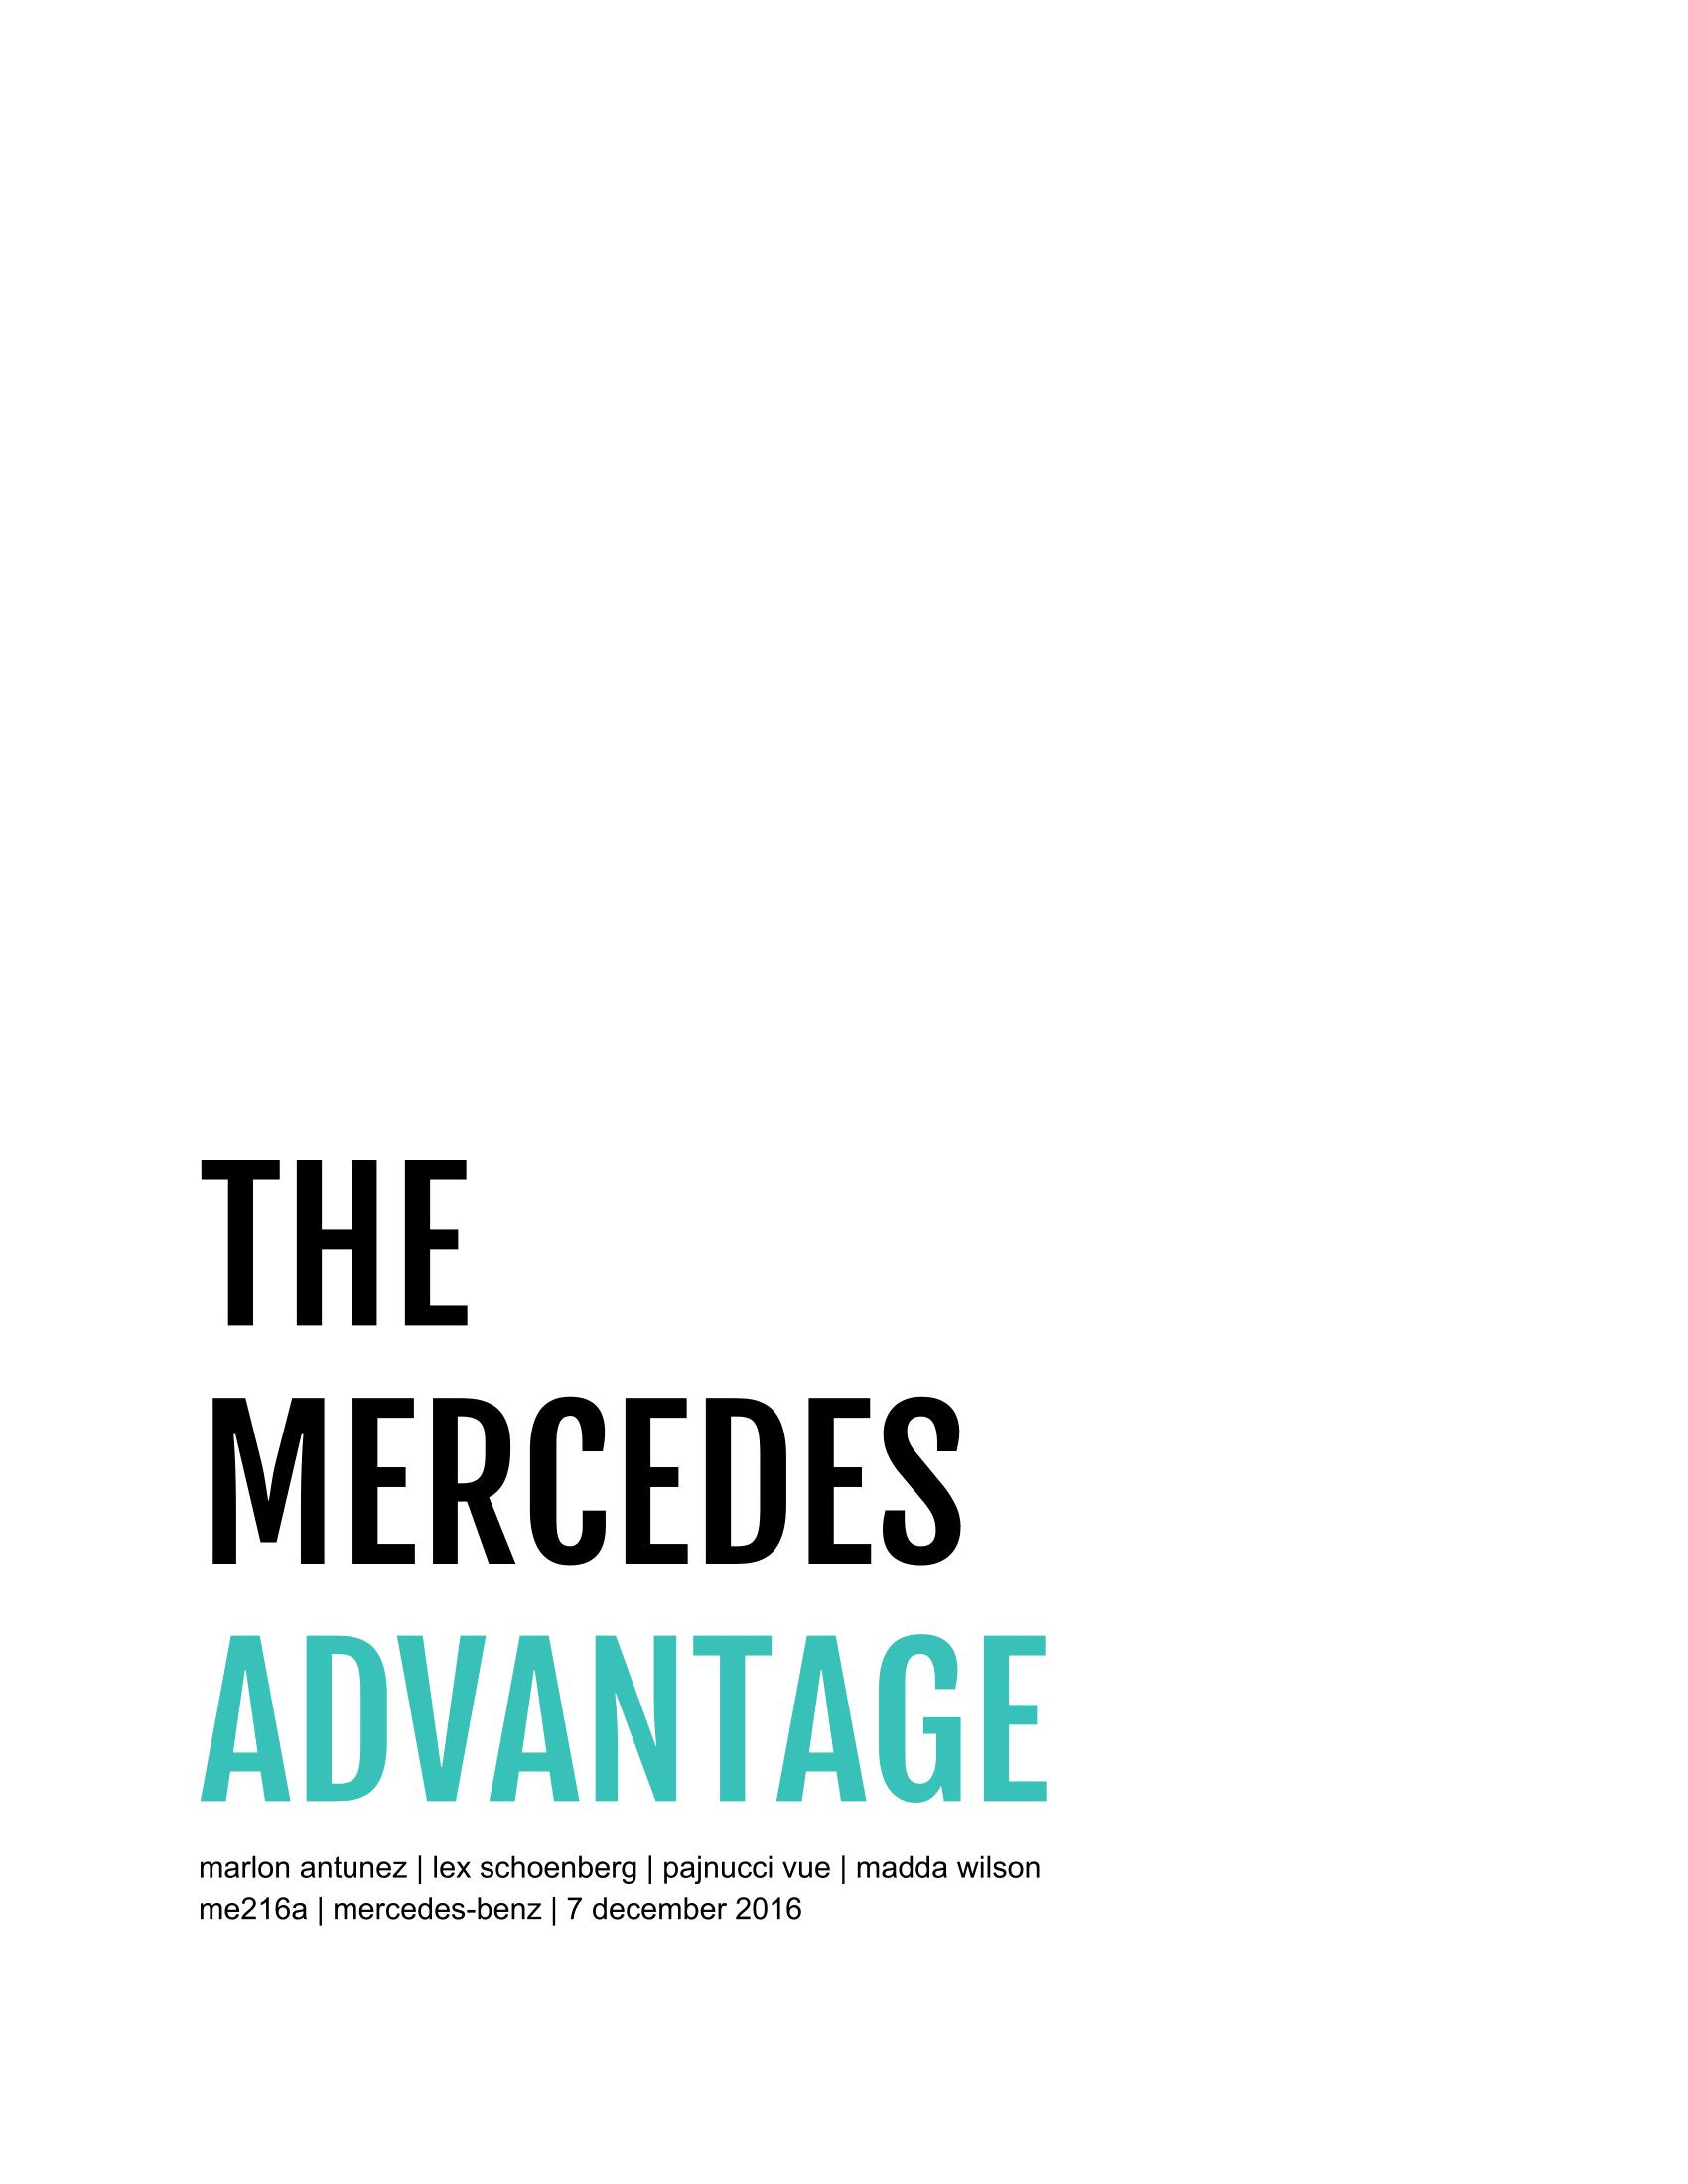 TheMercedesAdvantage (1)-1.png